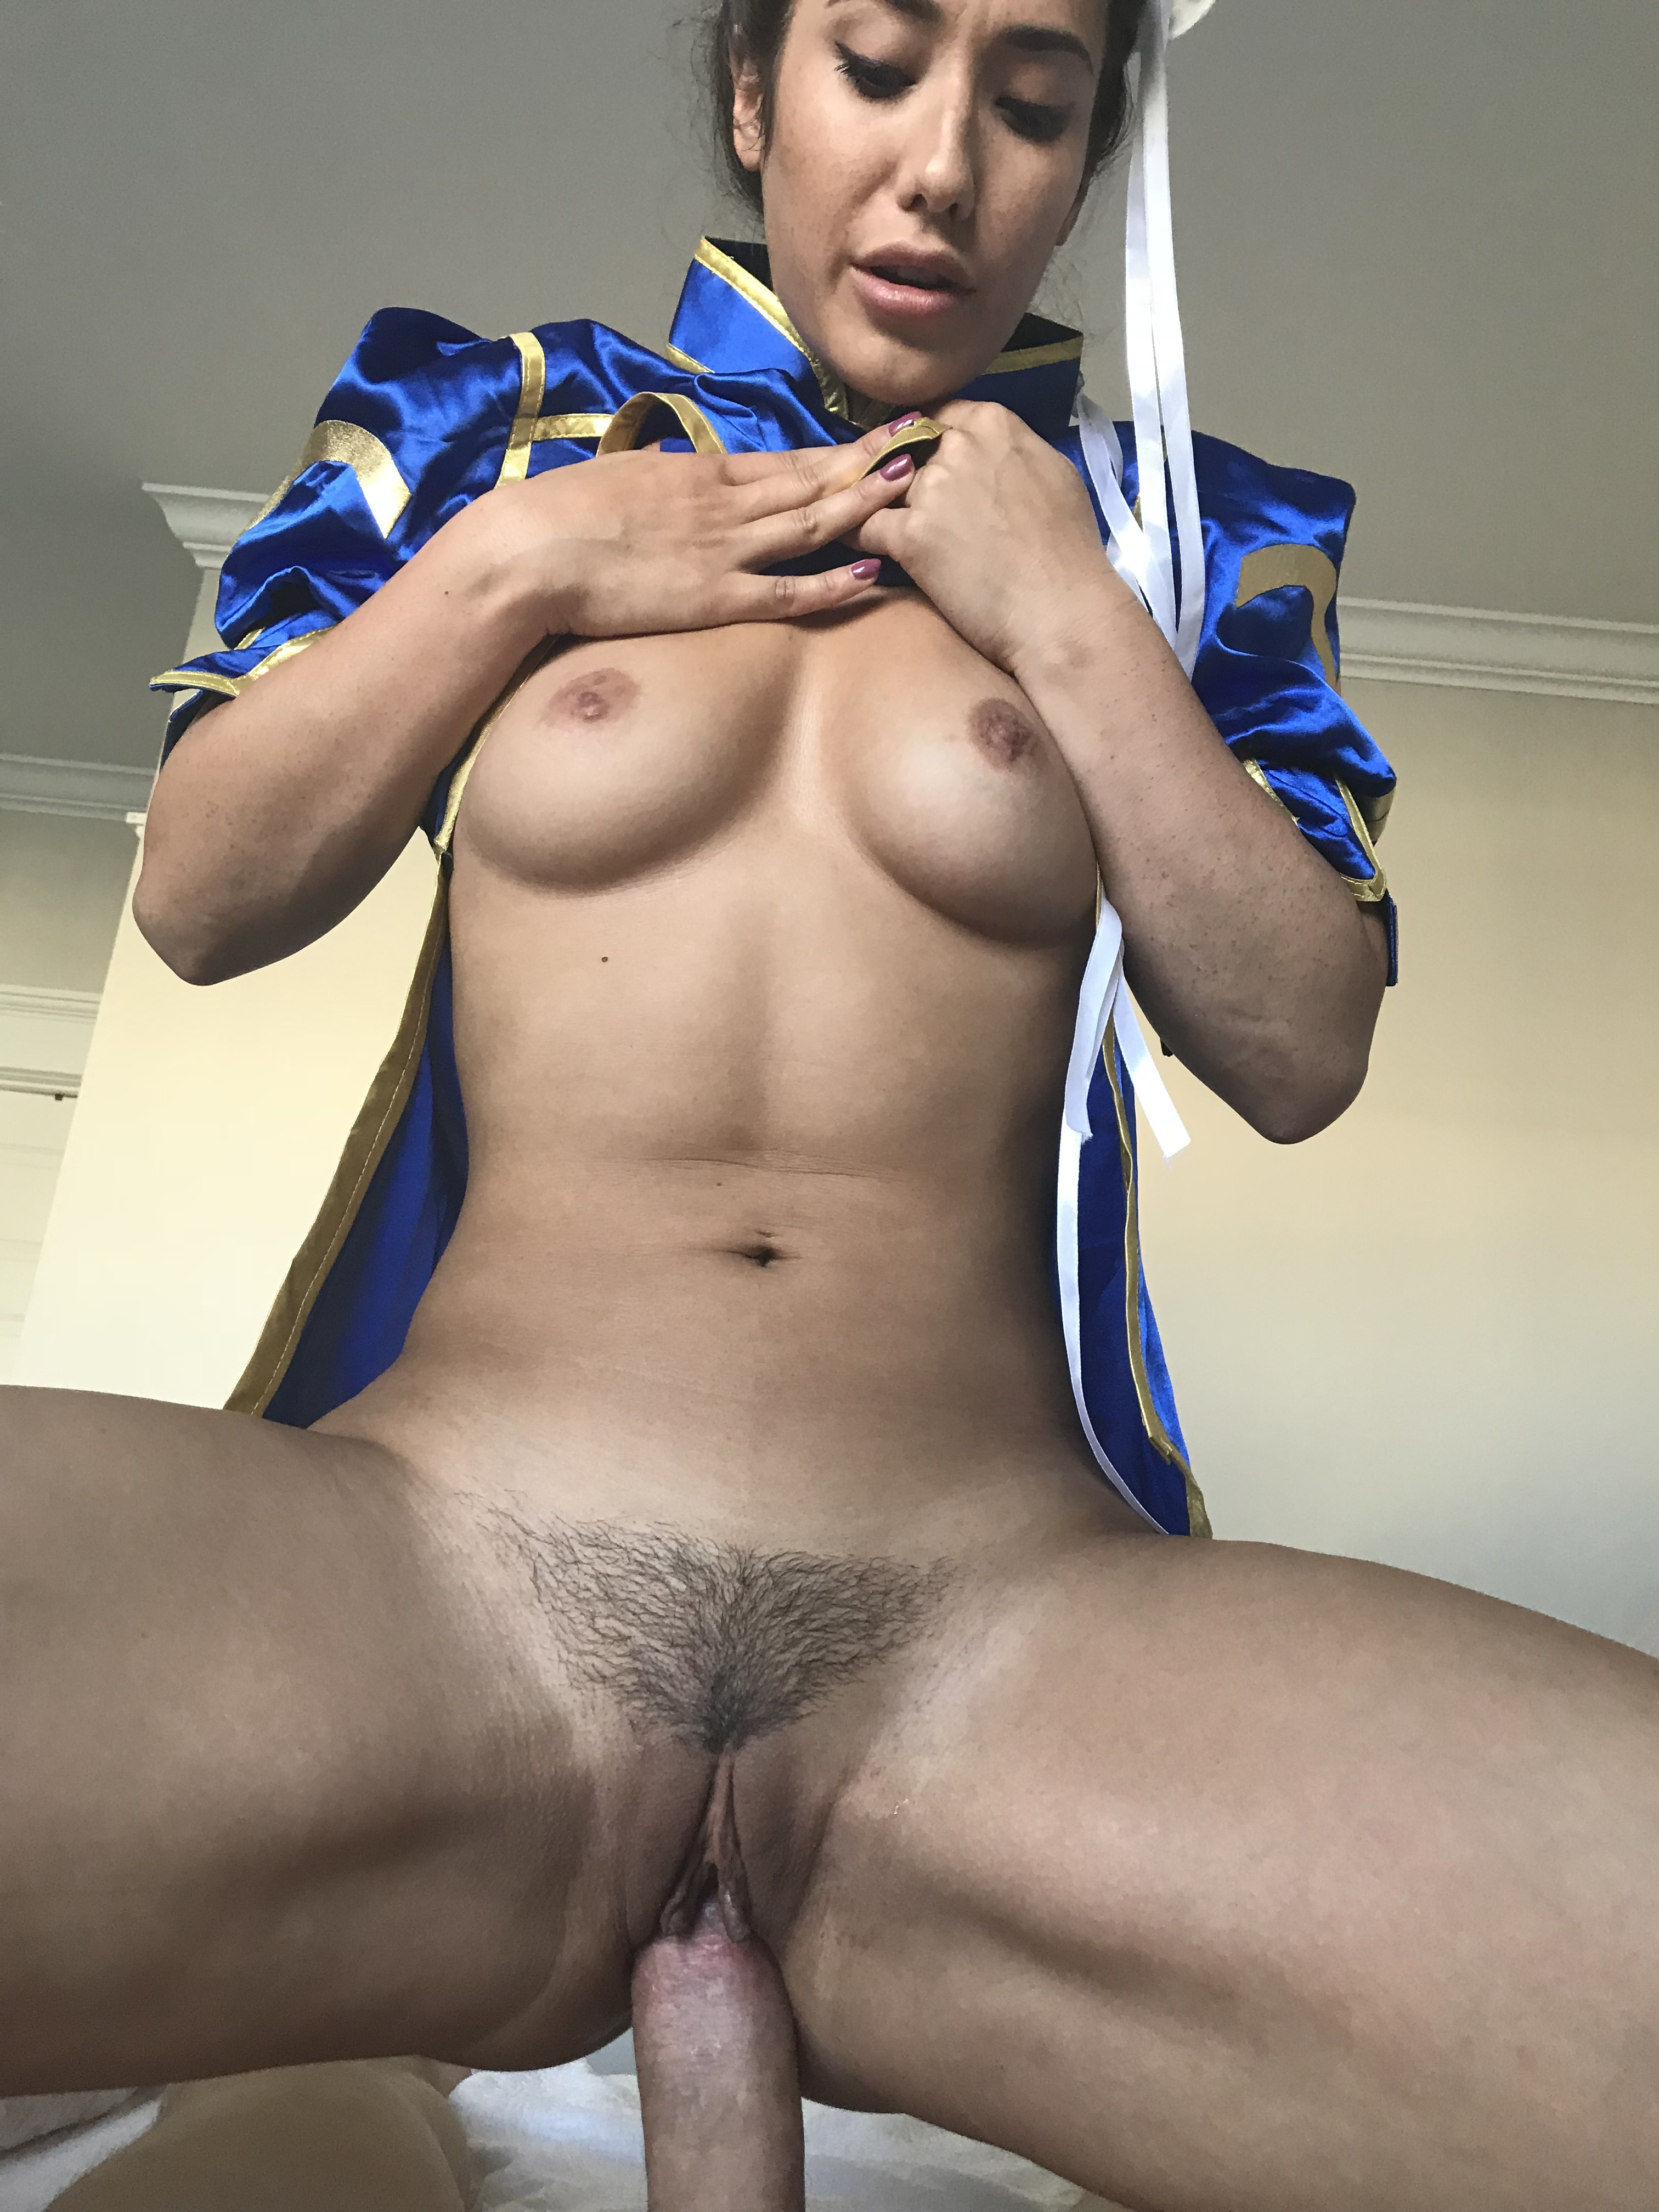 Eva Lovia, Fallinlovia, Onlyfans 0242